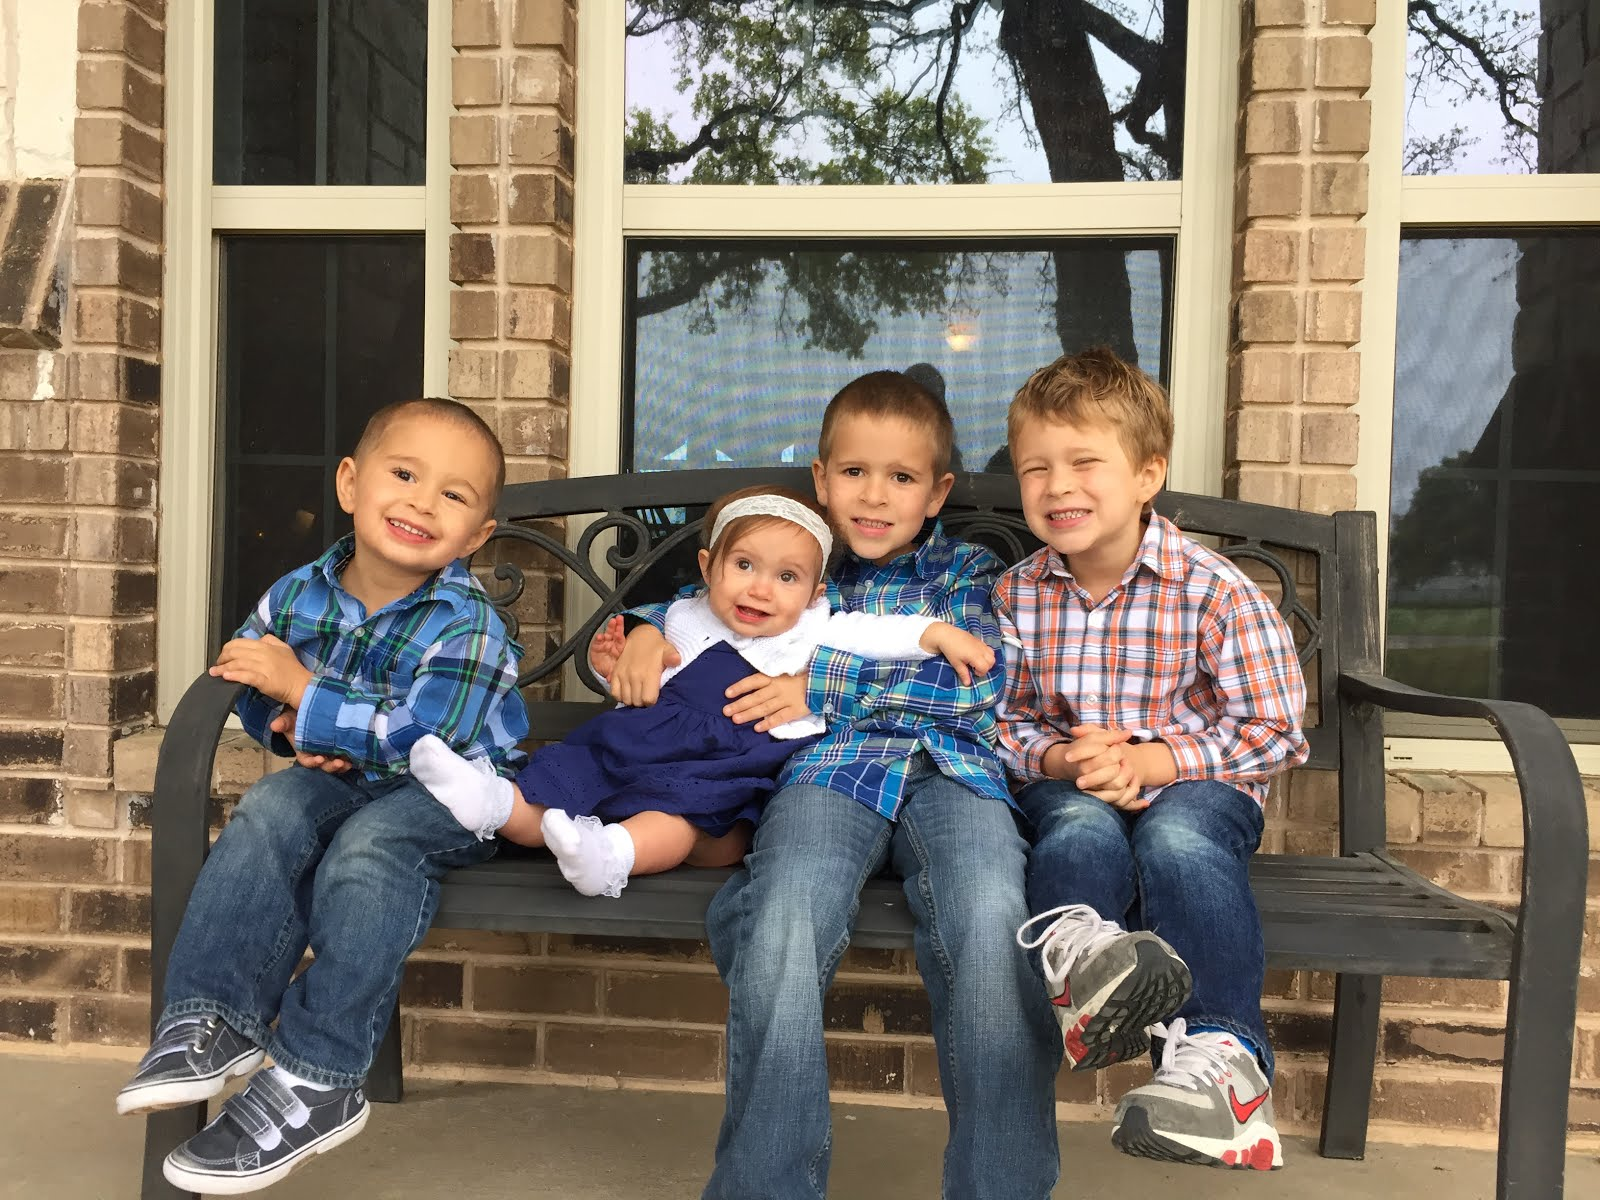 Weston 7, Caleb 5, Tyson 3, Lucy 1